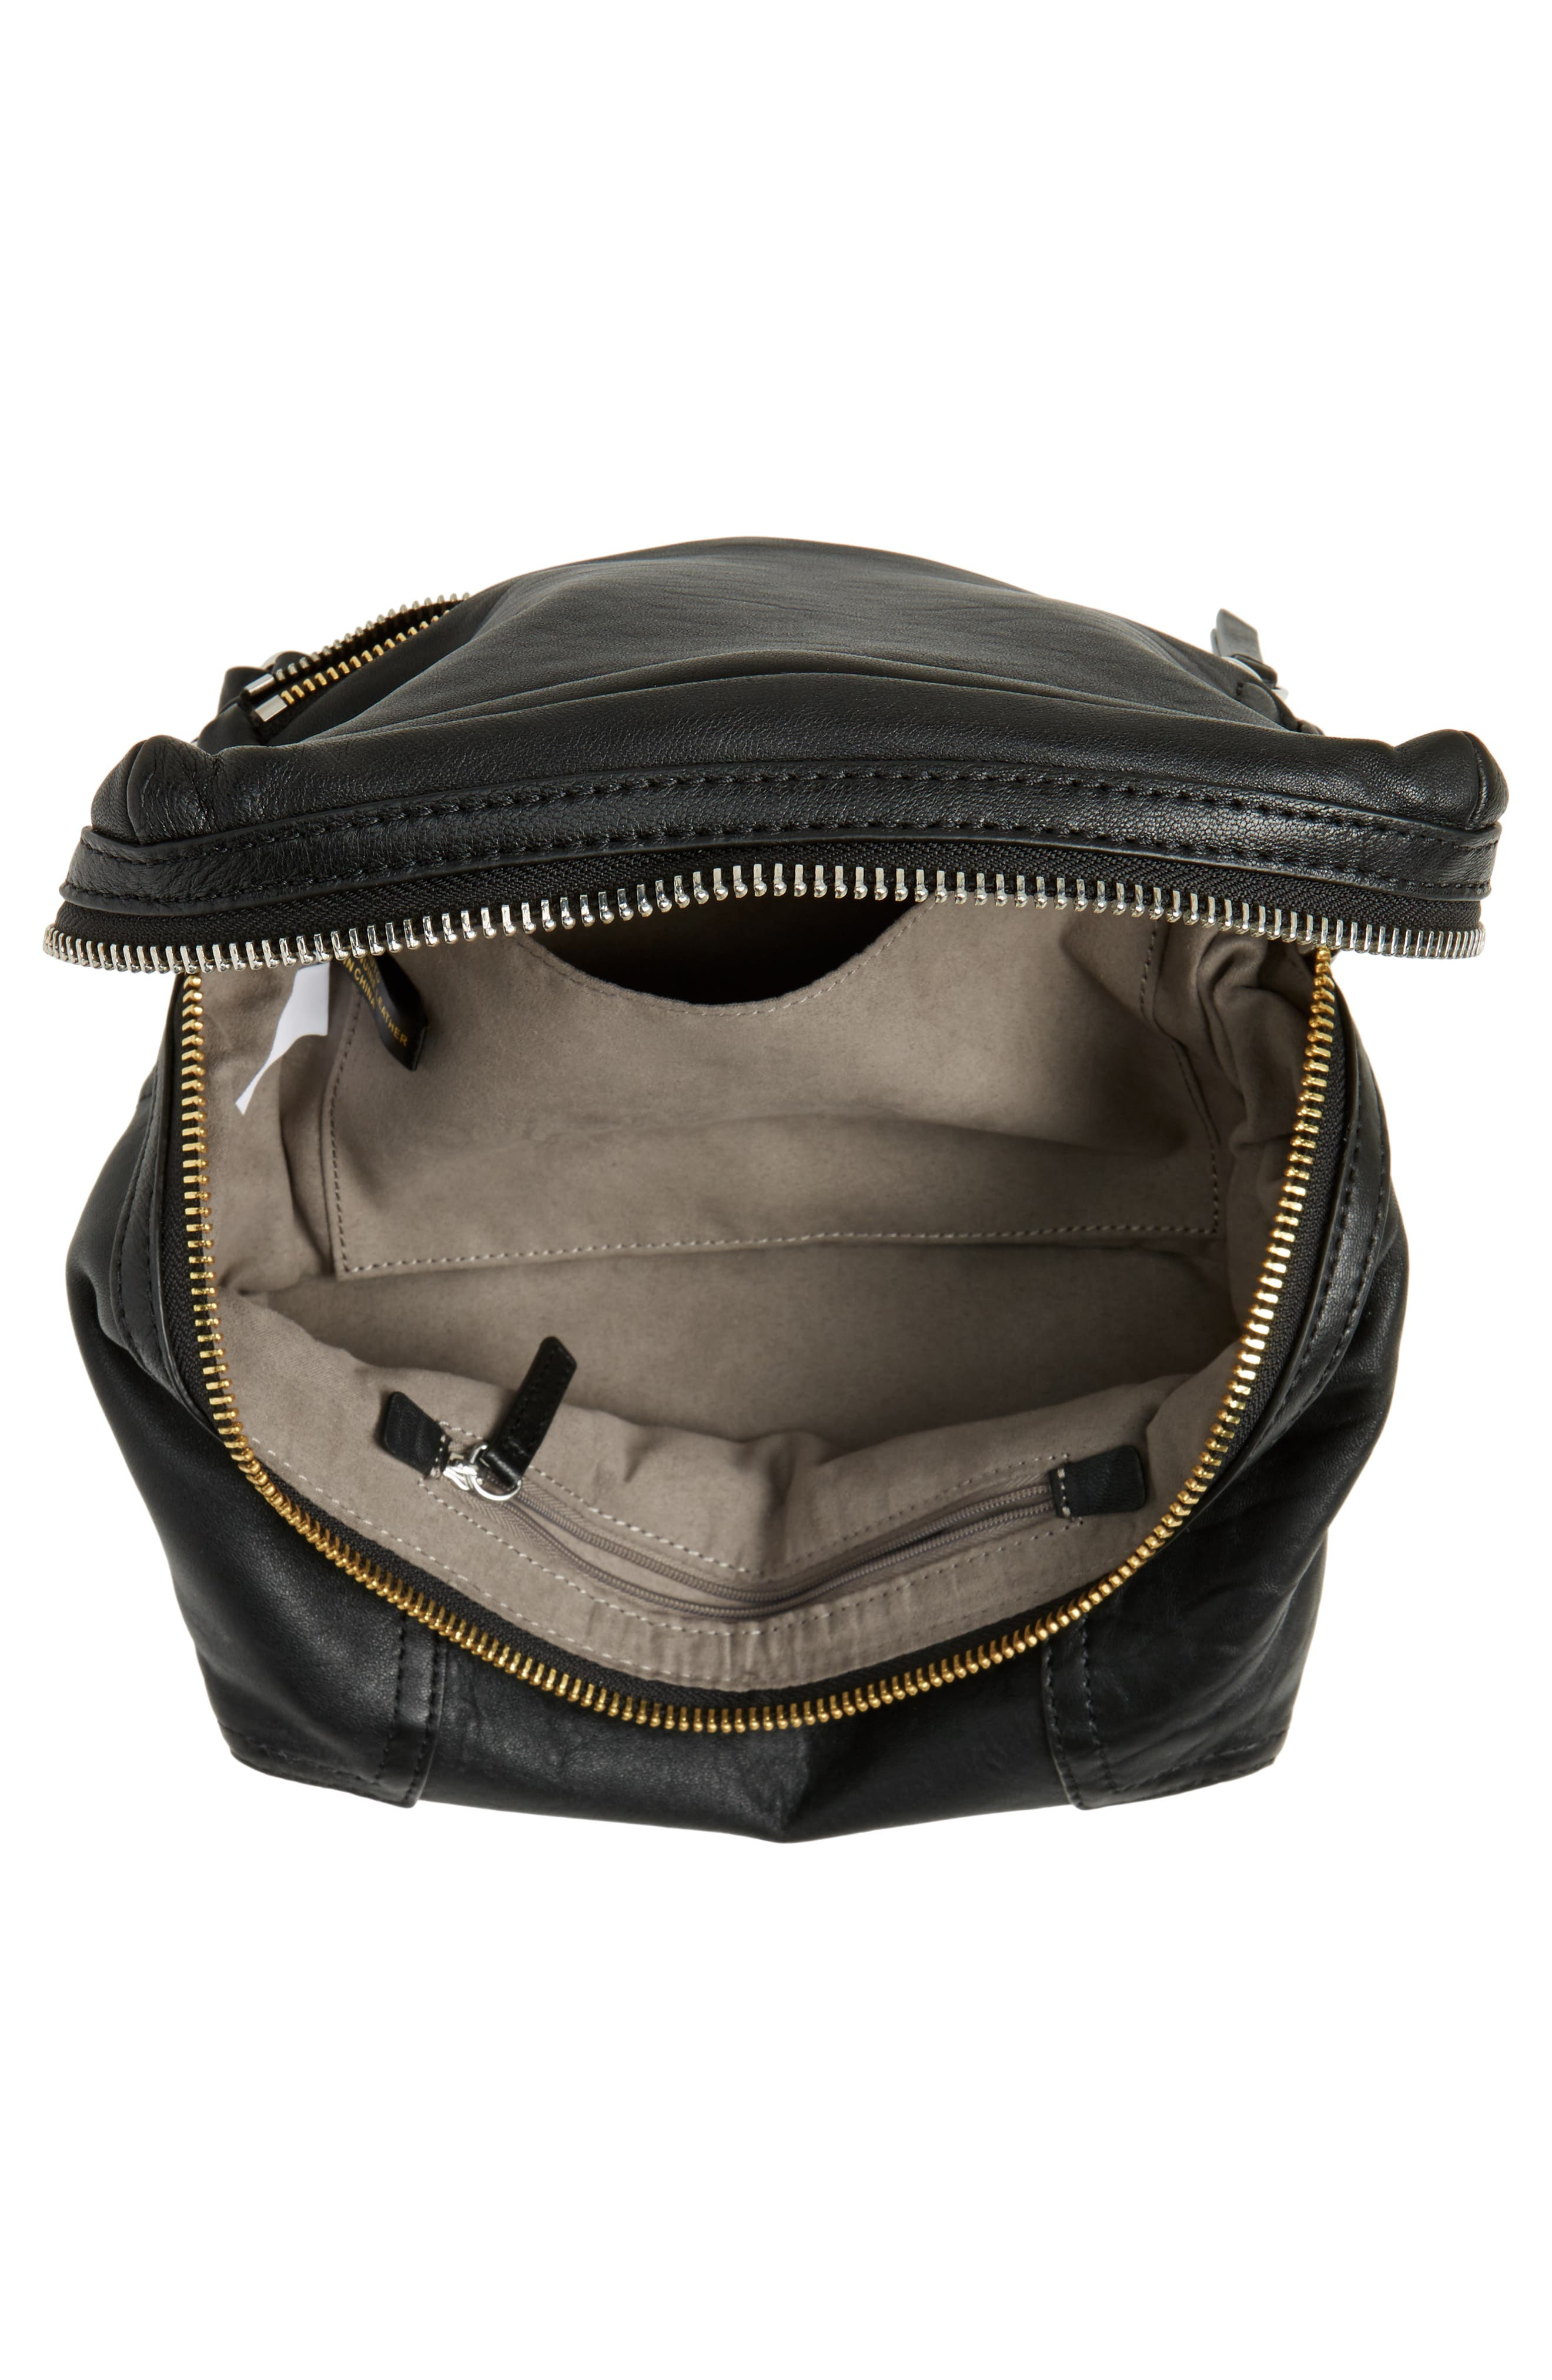 Medium Patch Leather Crossbody Bag,                             Alternate thumbnail 7, color,